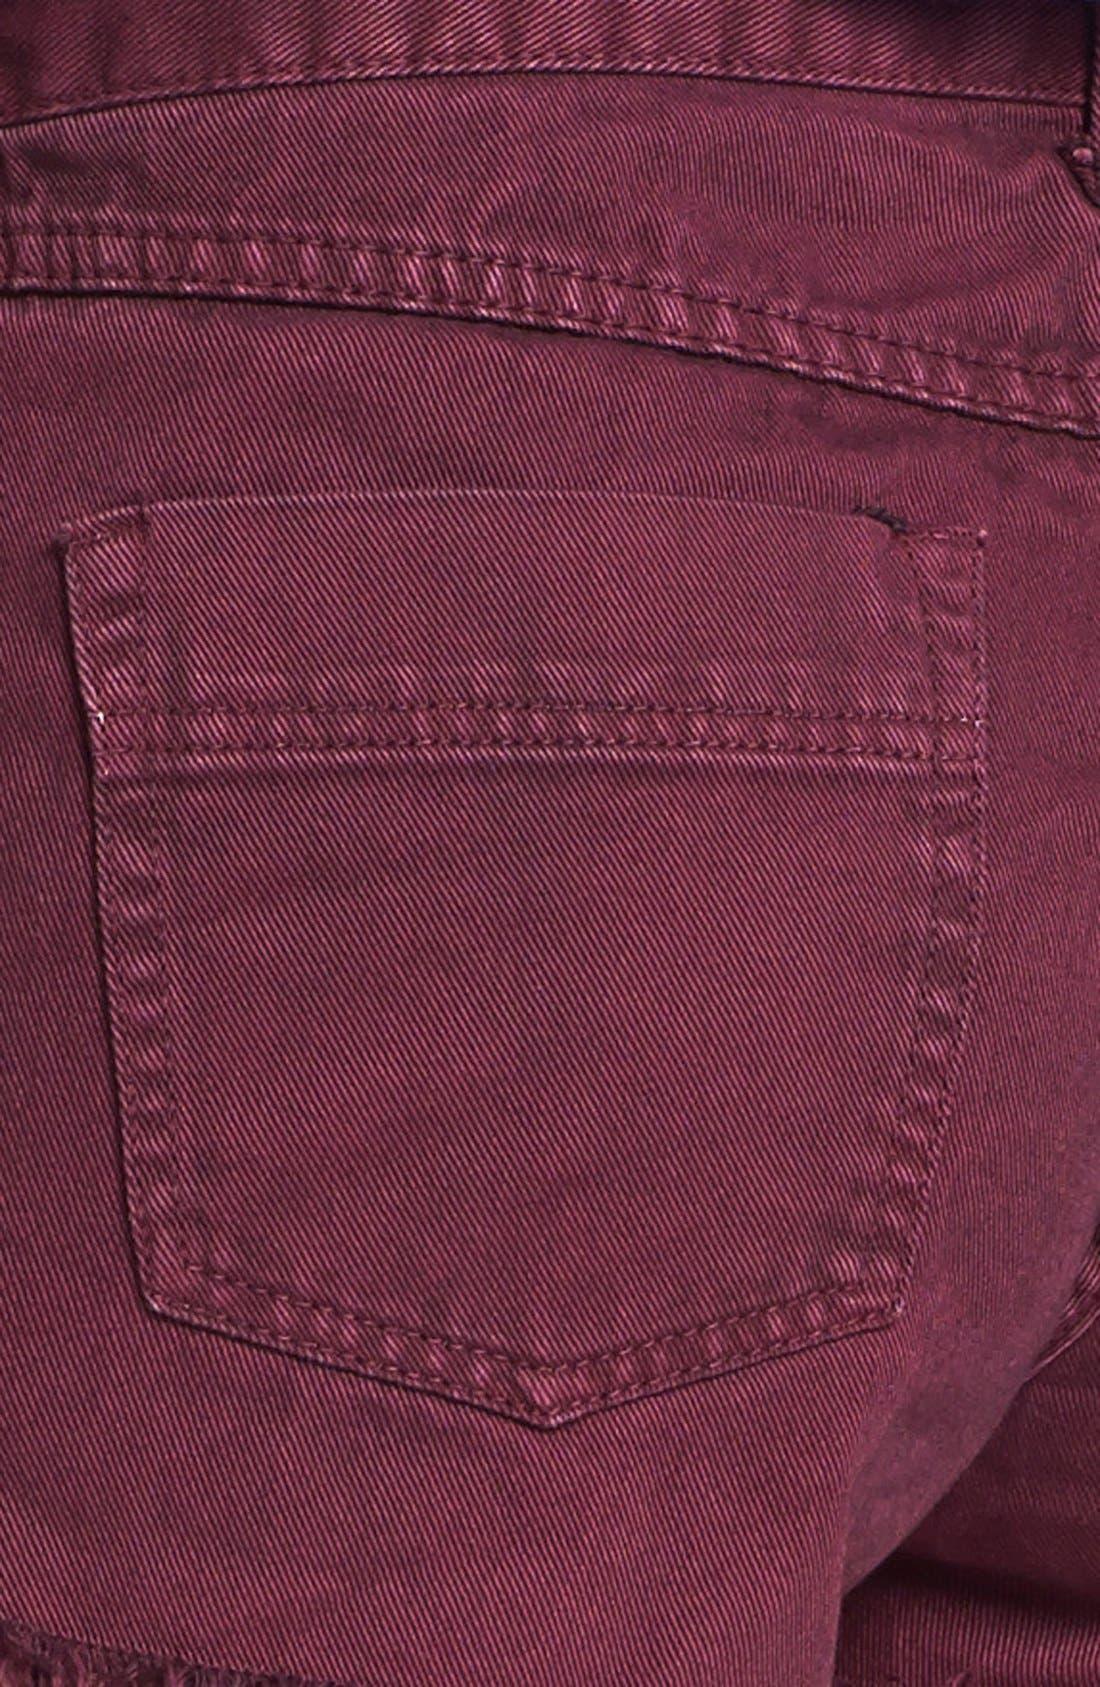 'Dolphin' Cutoff Denim Shorts,                             Alternate thumbnail 21, color,